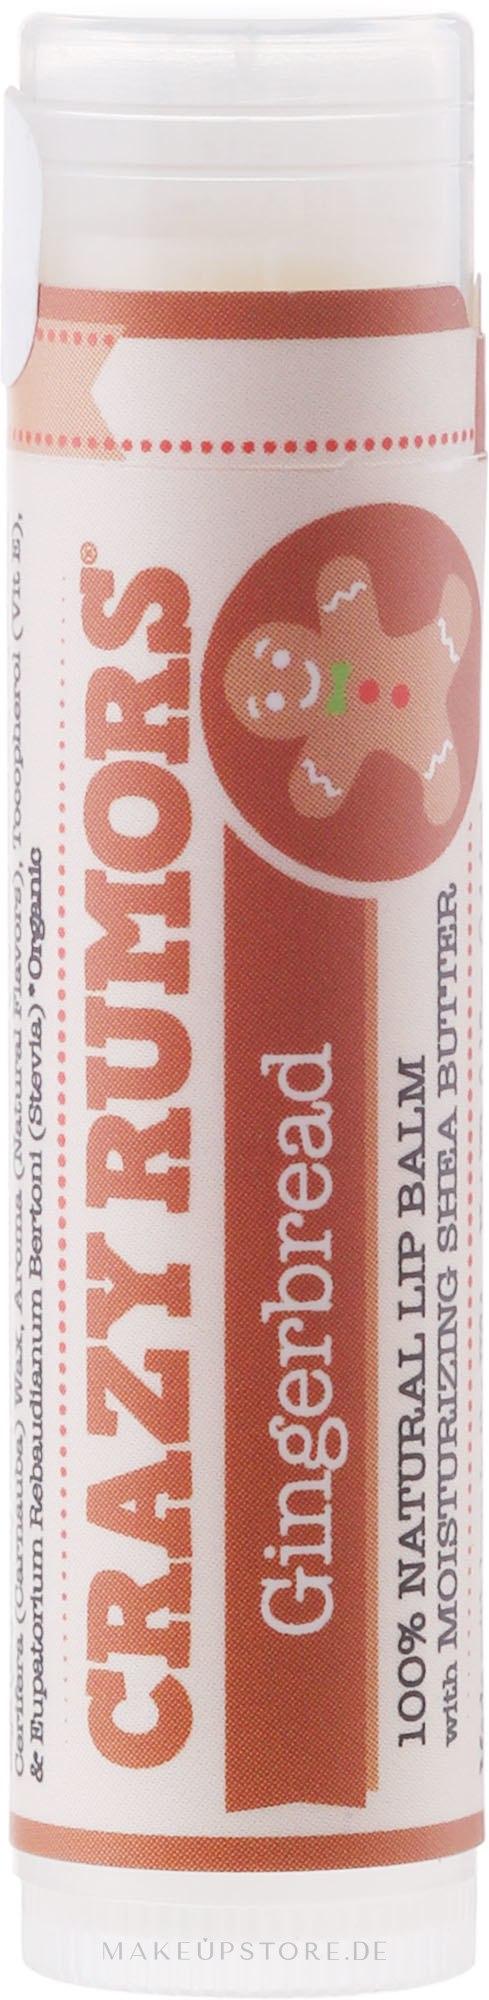 Lippenbalsam - Crazy Rumors Gingerbread Lip Balm — Bild 4.4 ml